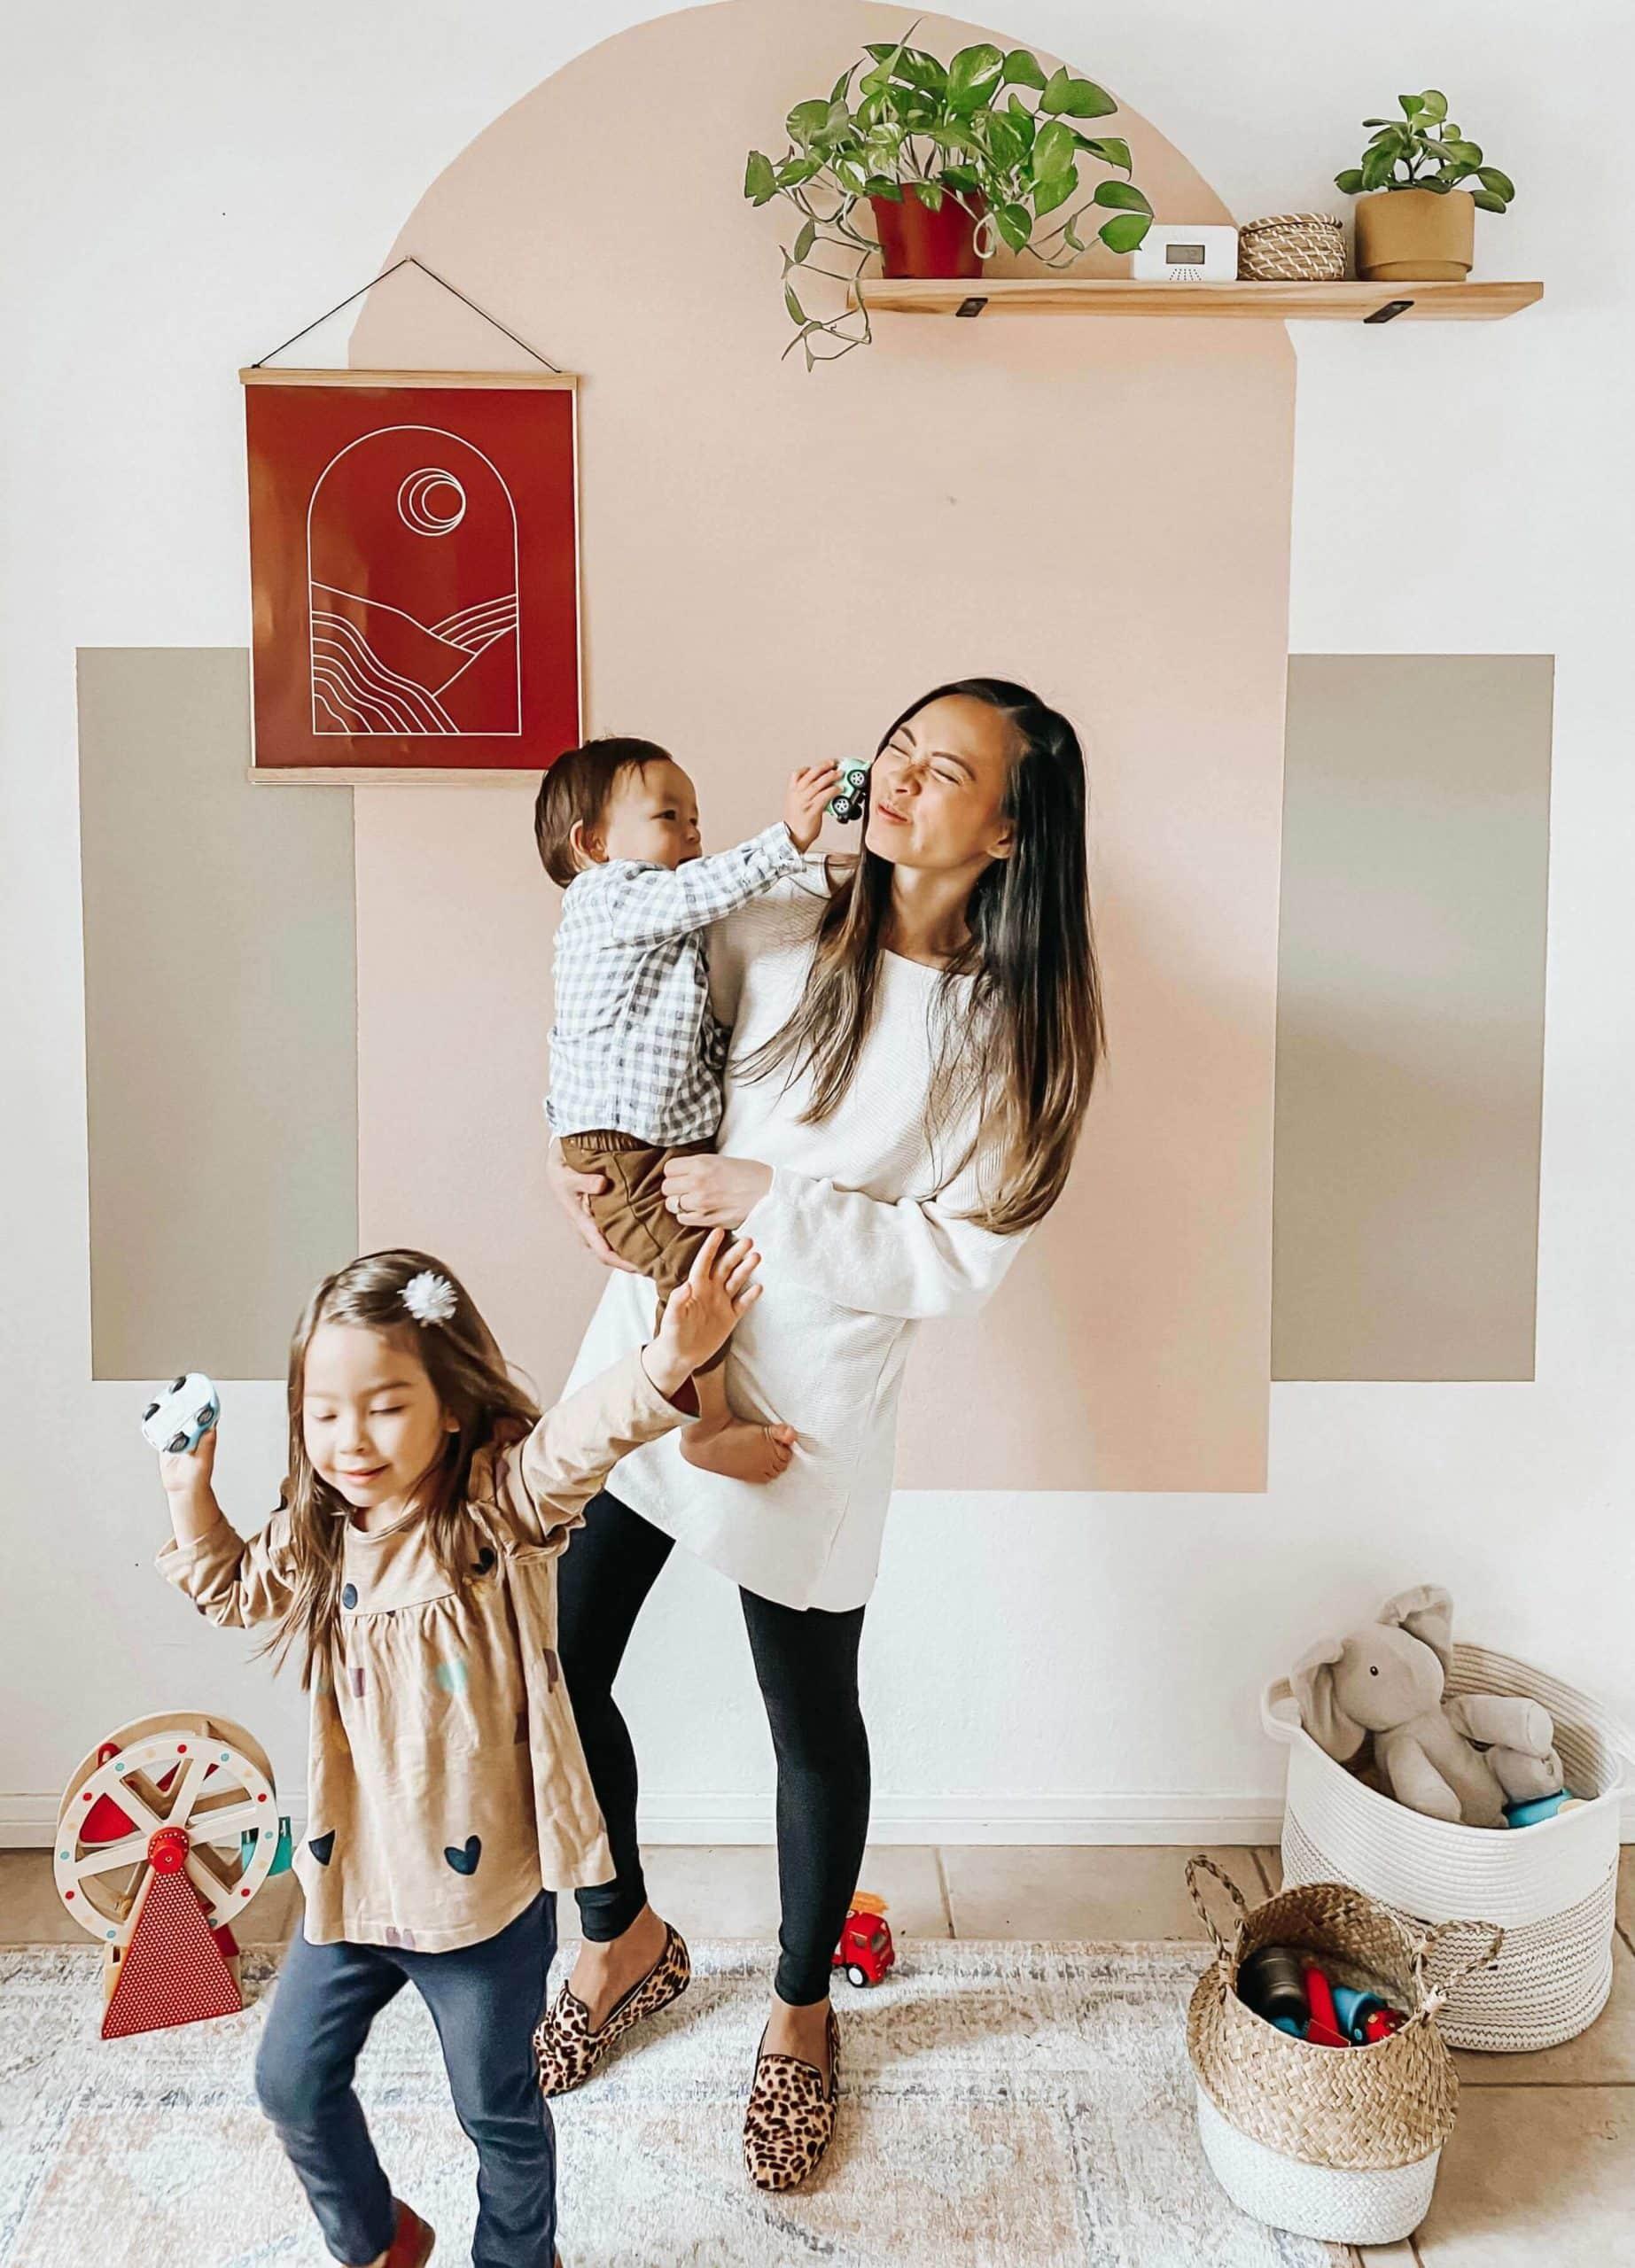 first-alert-carbon-monoxide-alarm-safe-home-family-must-have